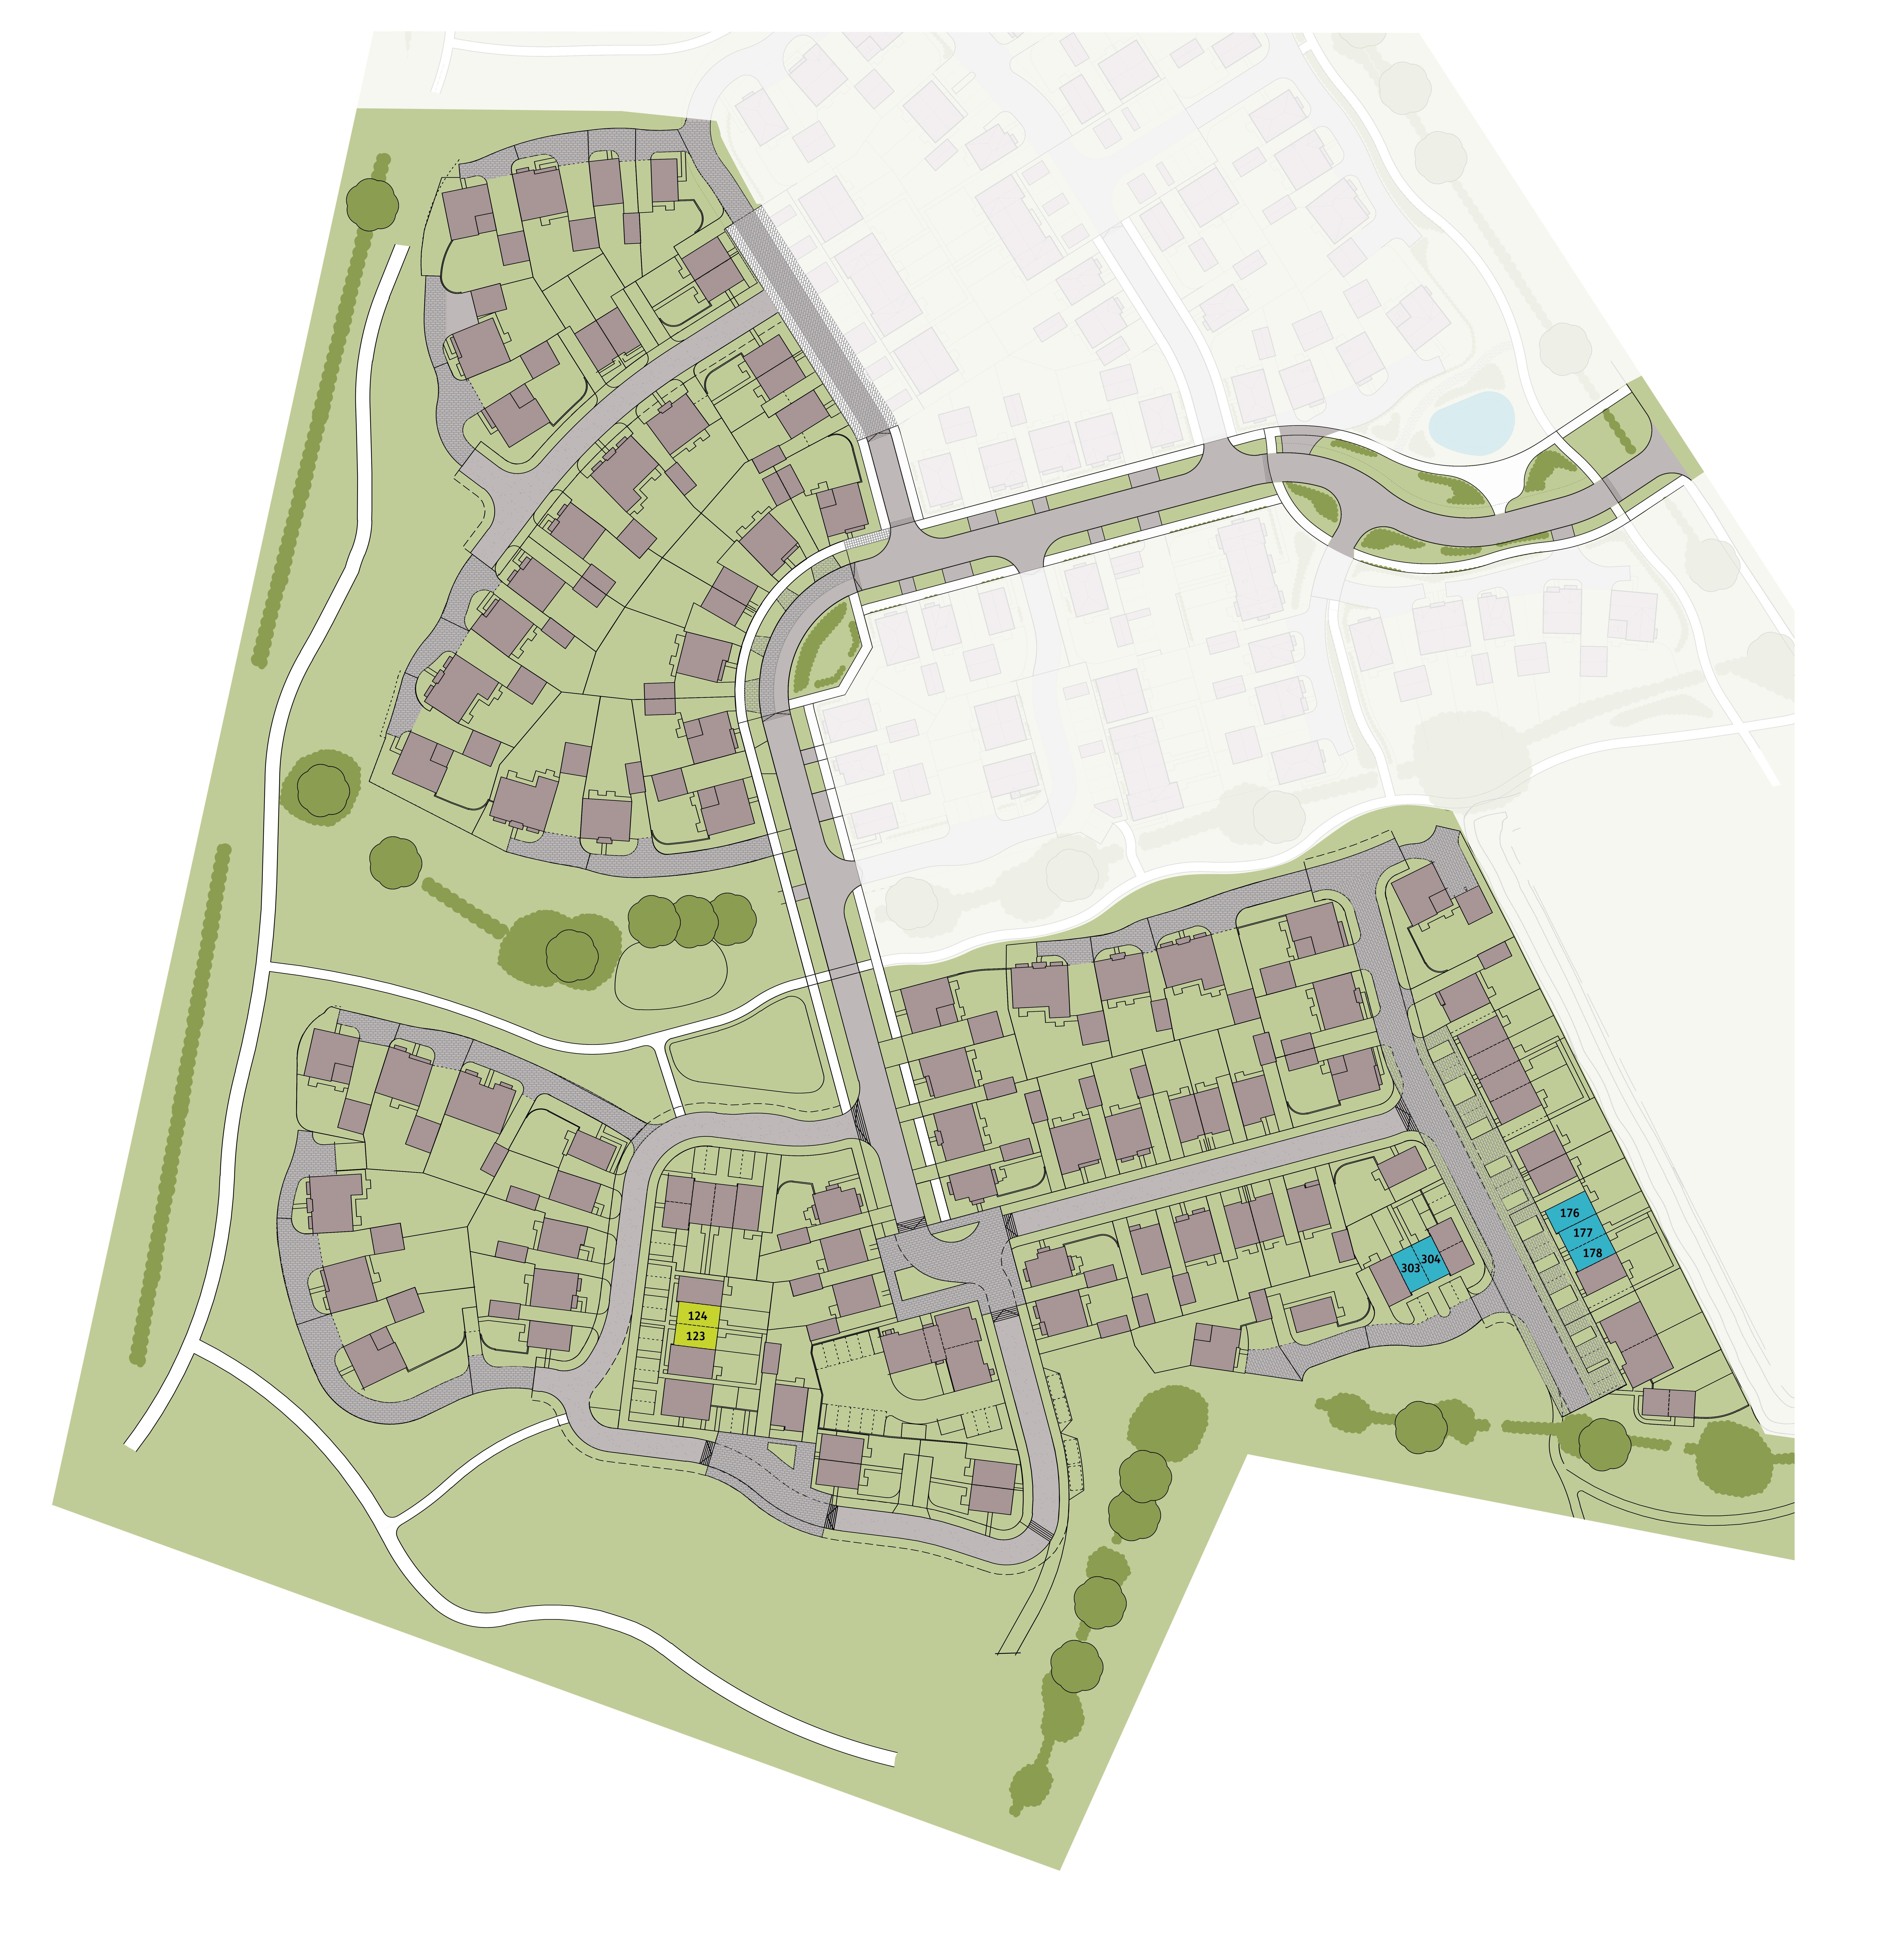 bluebell green development plan phase 2